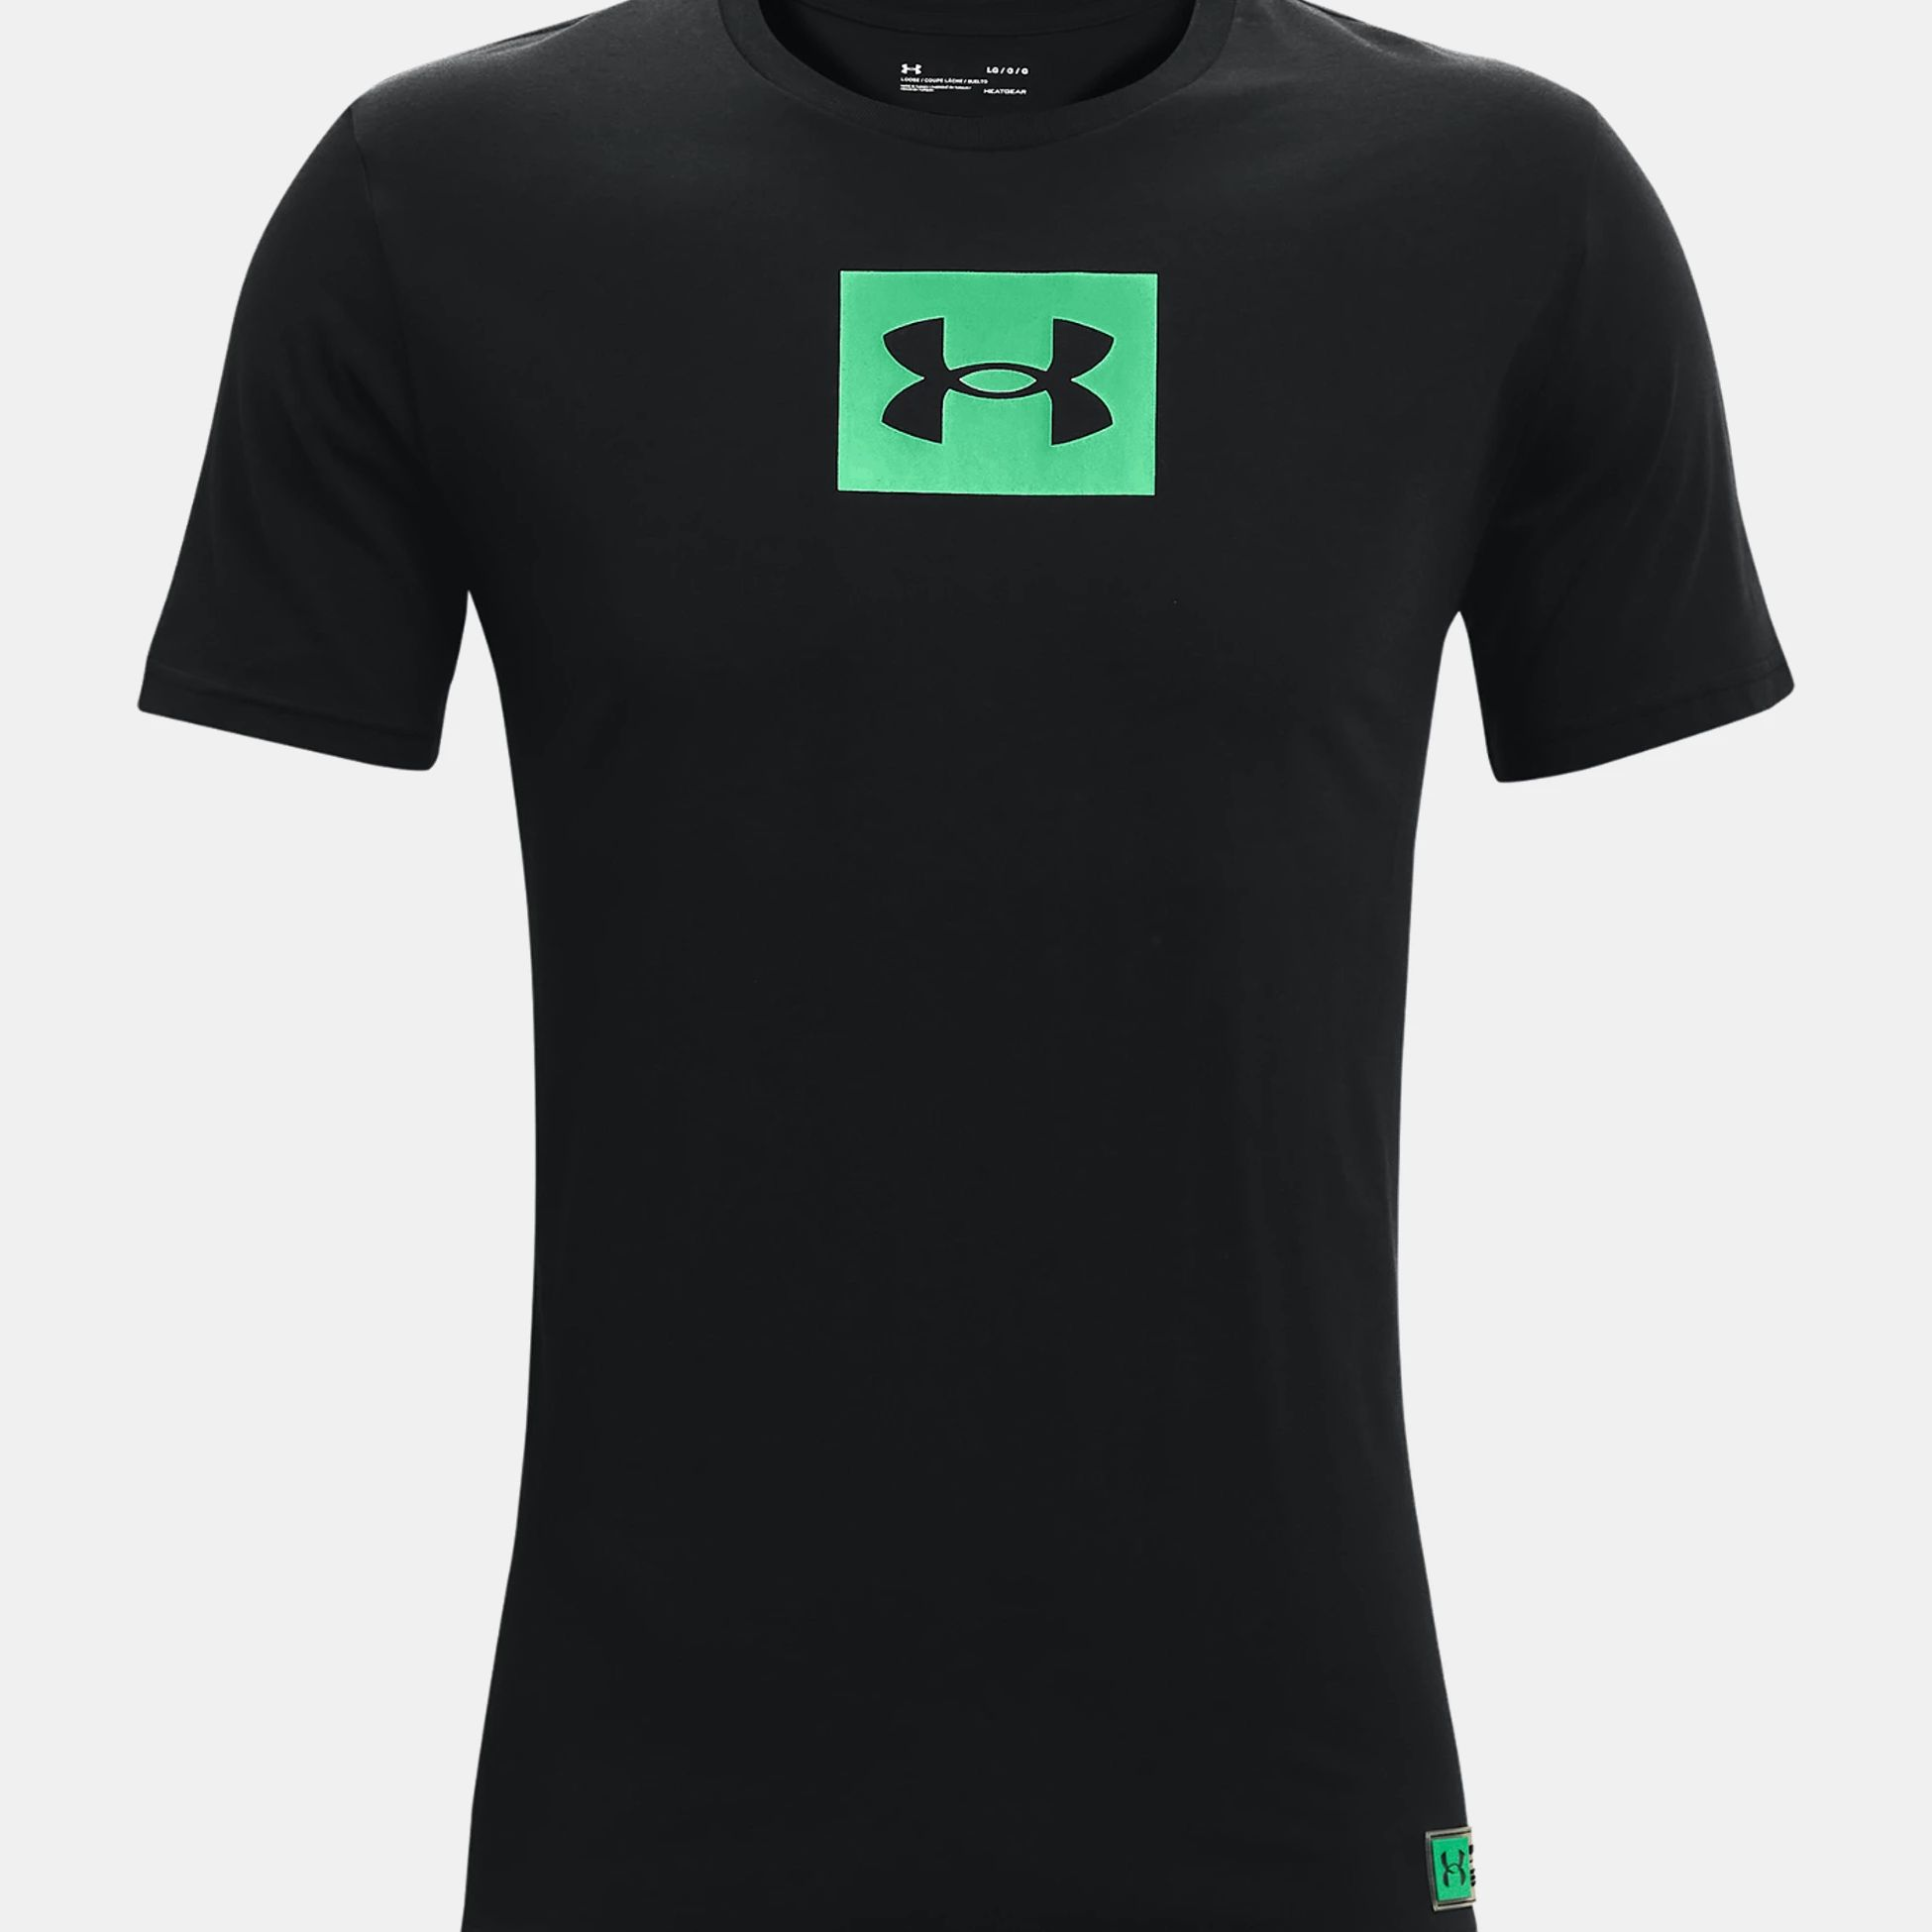 Îmbrăcăminte -  under armour UA Boxed All Athletes Short Sleeve